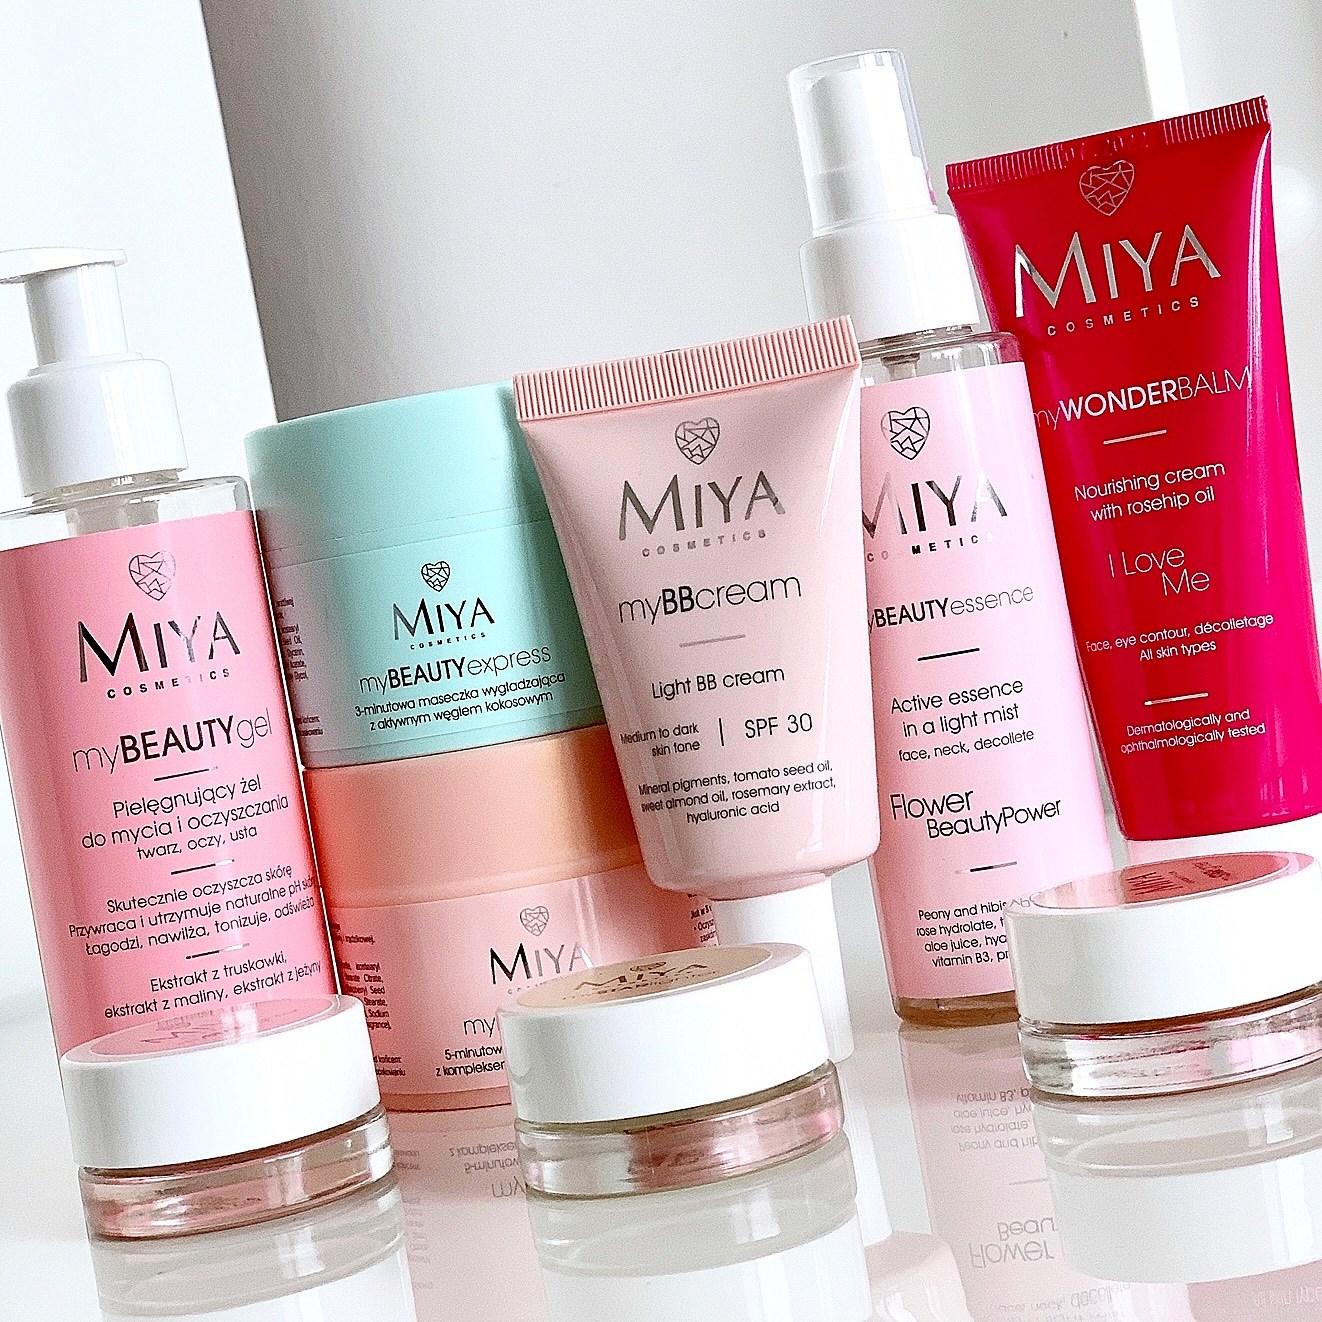 Kosmetyki Miya blog, opinie